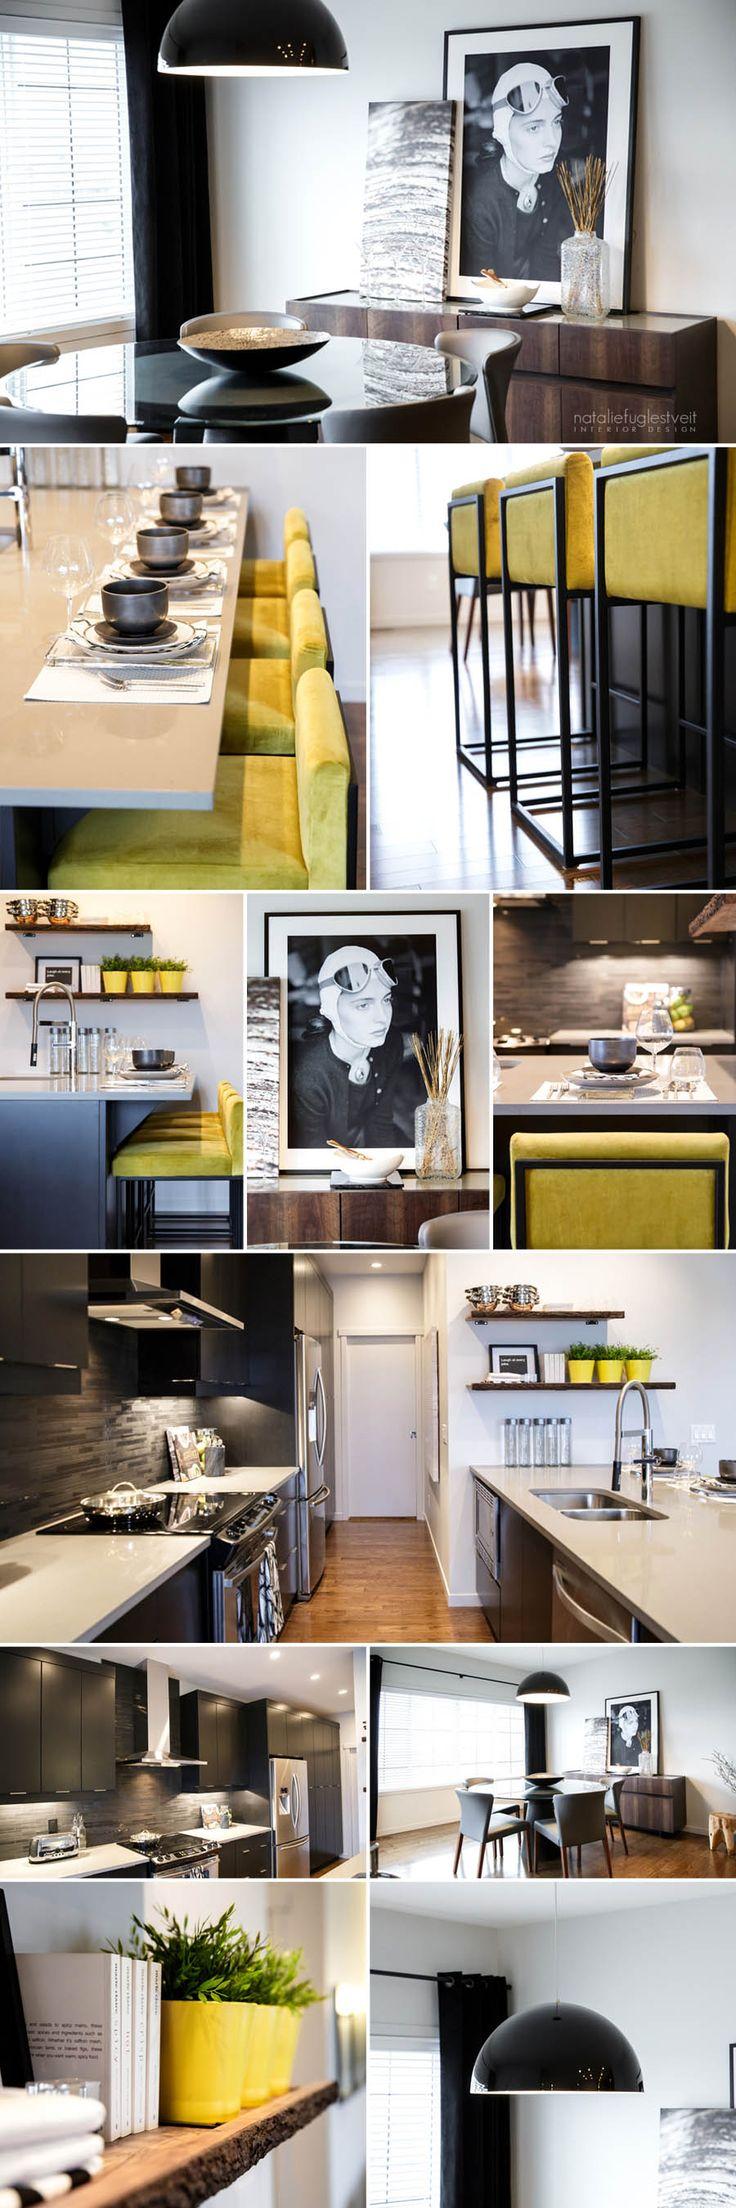 Rustic Modern Kitchen & Dining Rm by Calgary Interior Designer